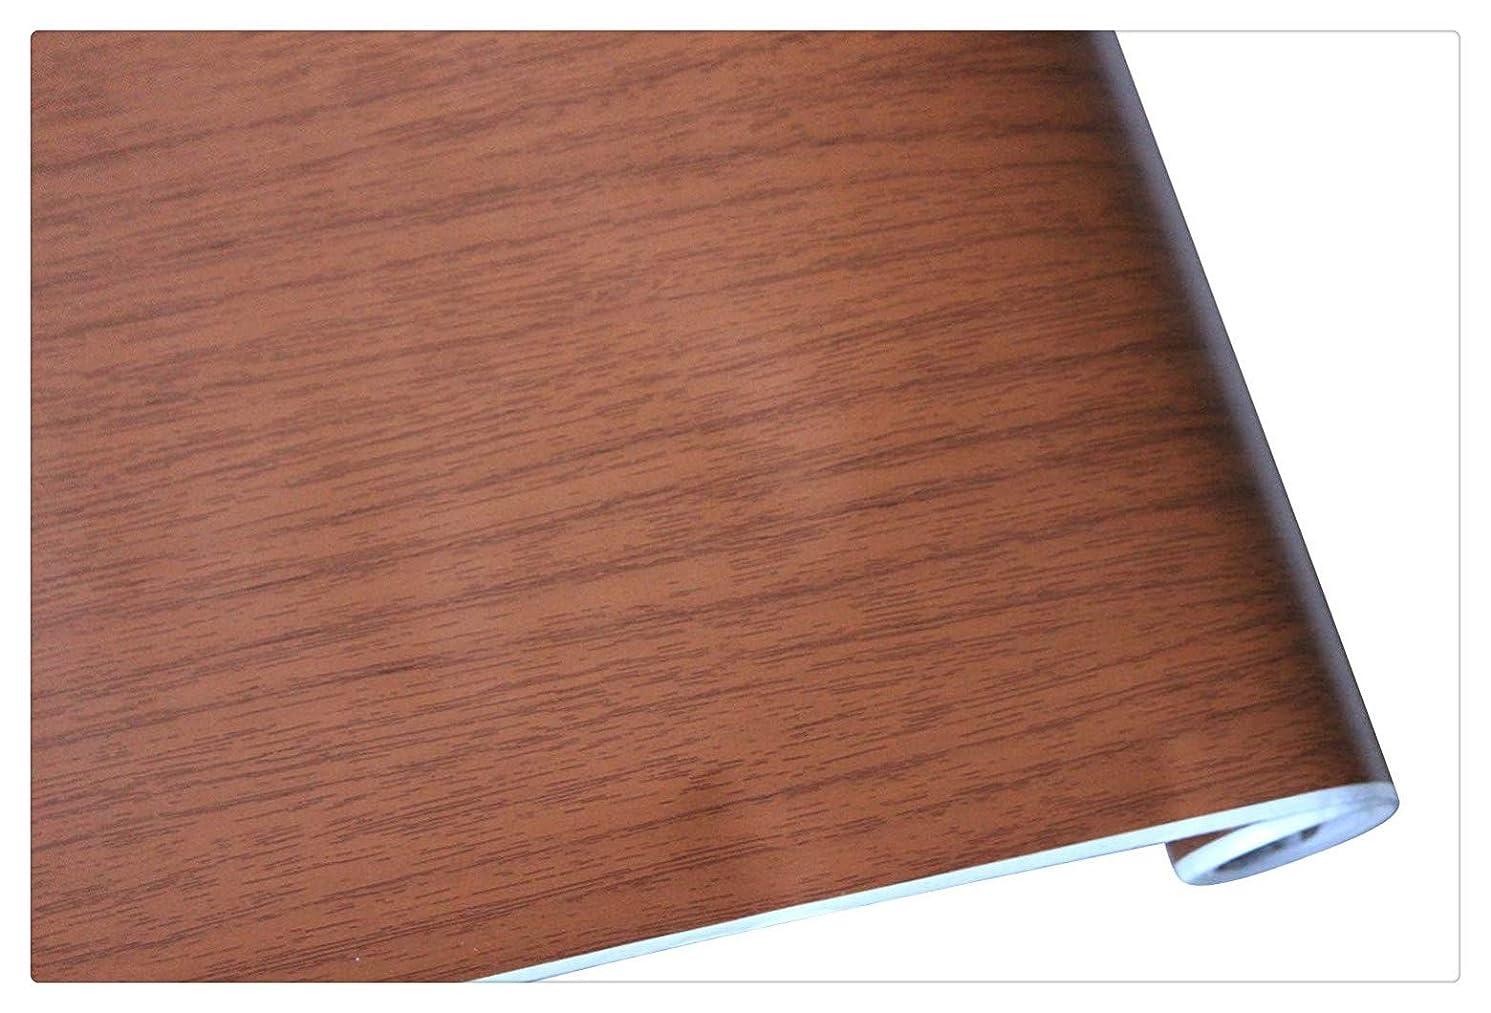 Peel and Stick Wood Grain Wallpaper Self Adhesive Film Matte for Furniture Kitchen Countertop Table 17.7